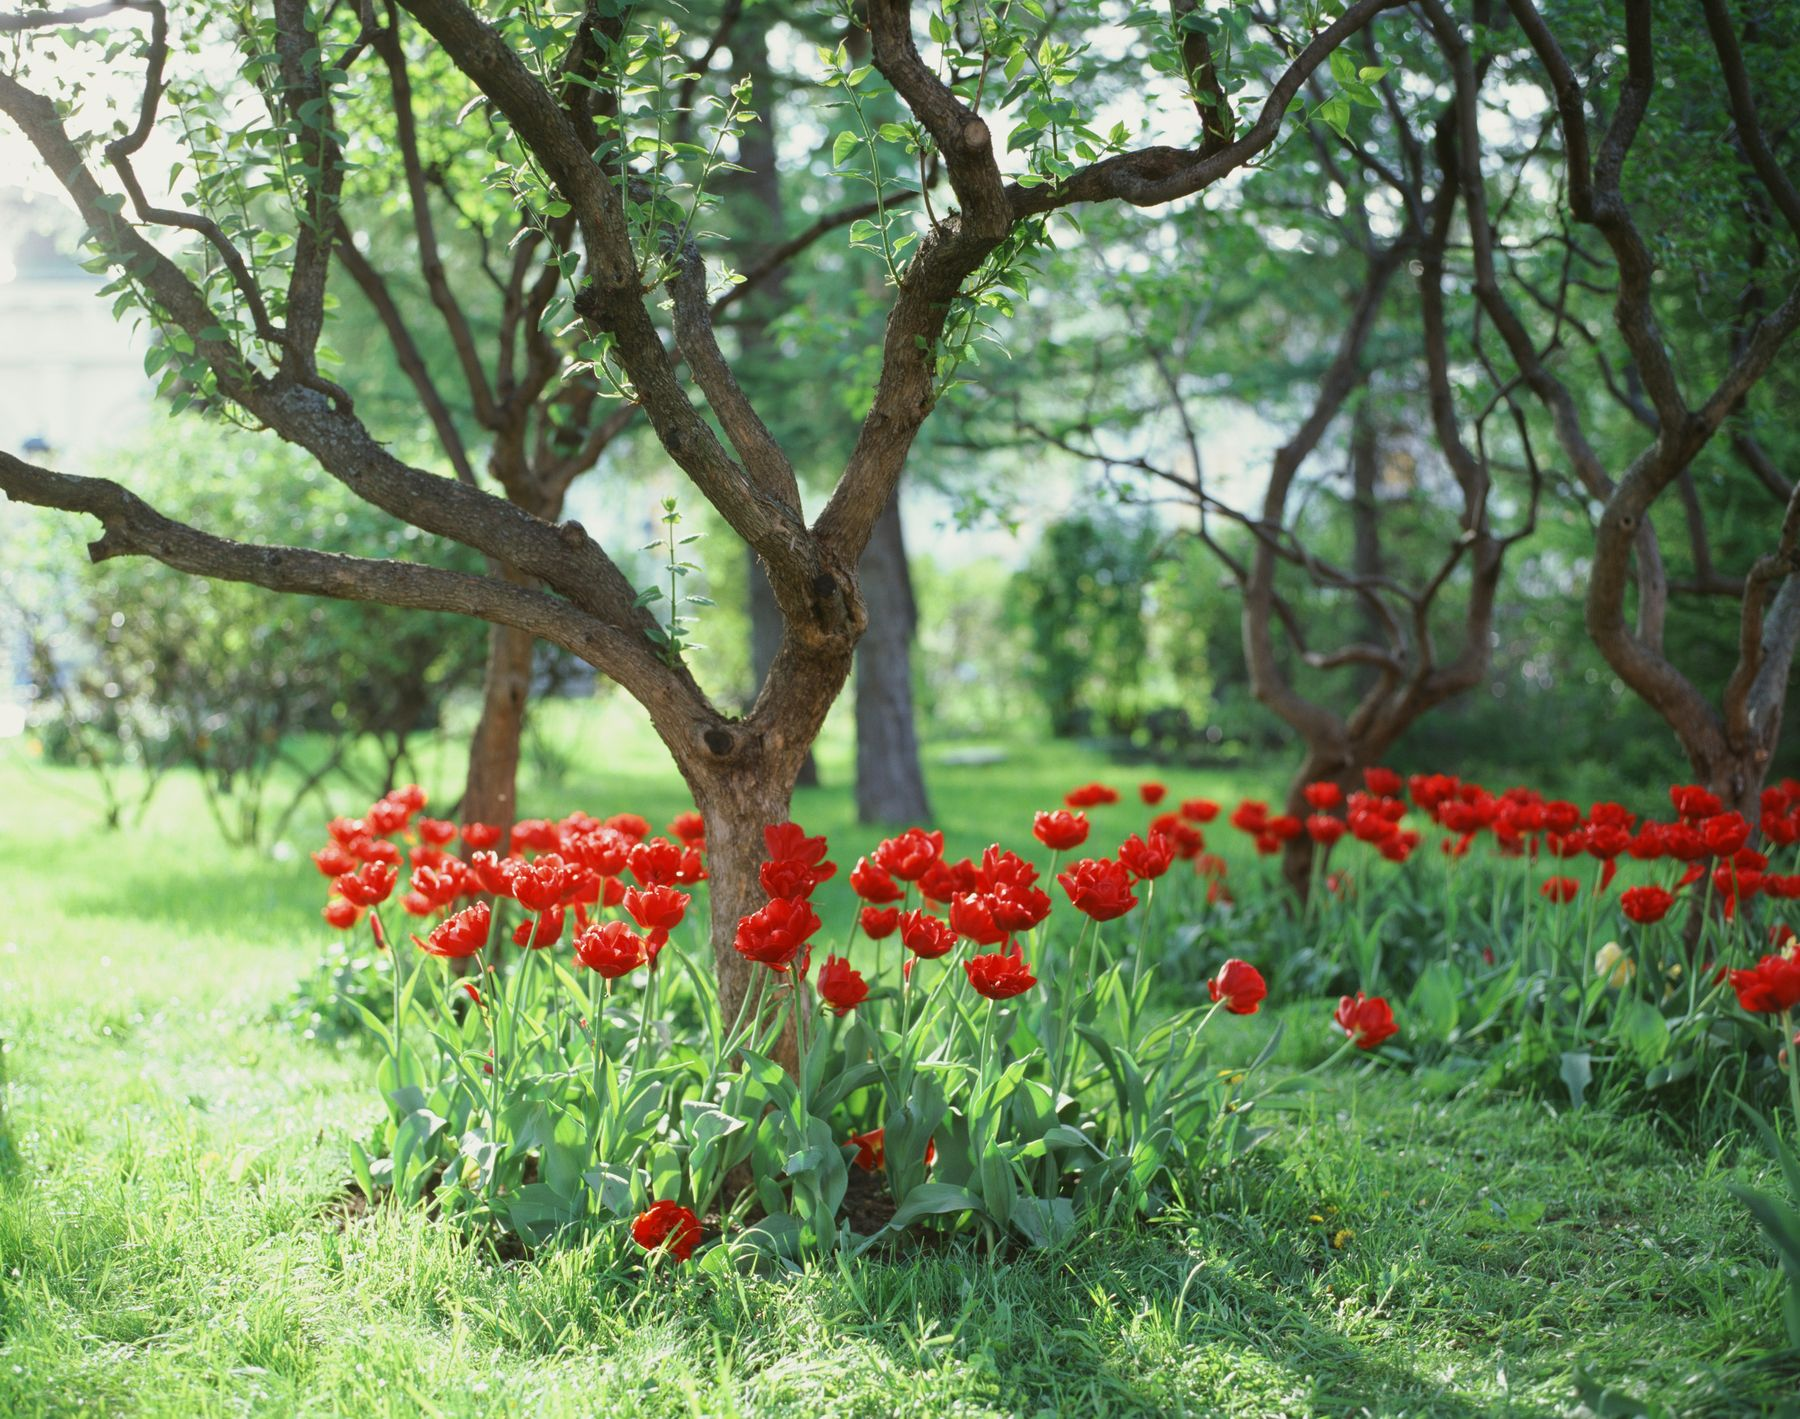 Красные тюльпаны Pentax 67ii Kodak e100 пленка 120 средний формат 6х7 67 слайд